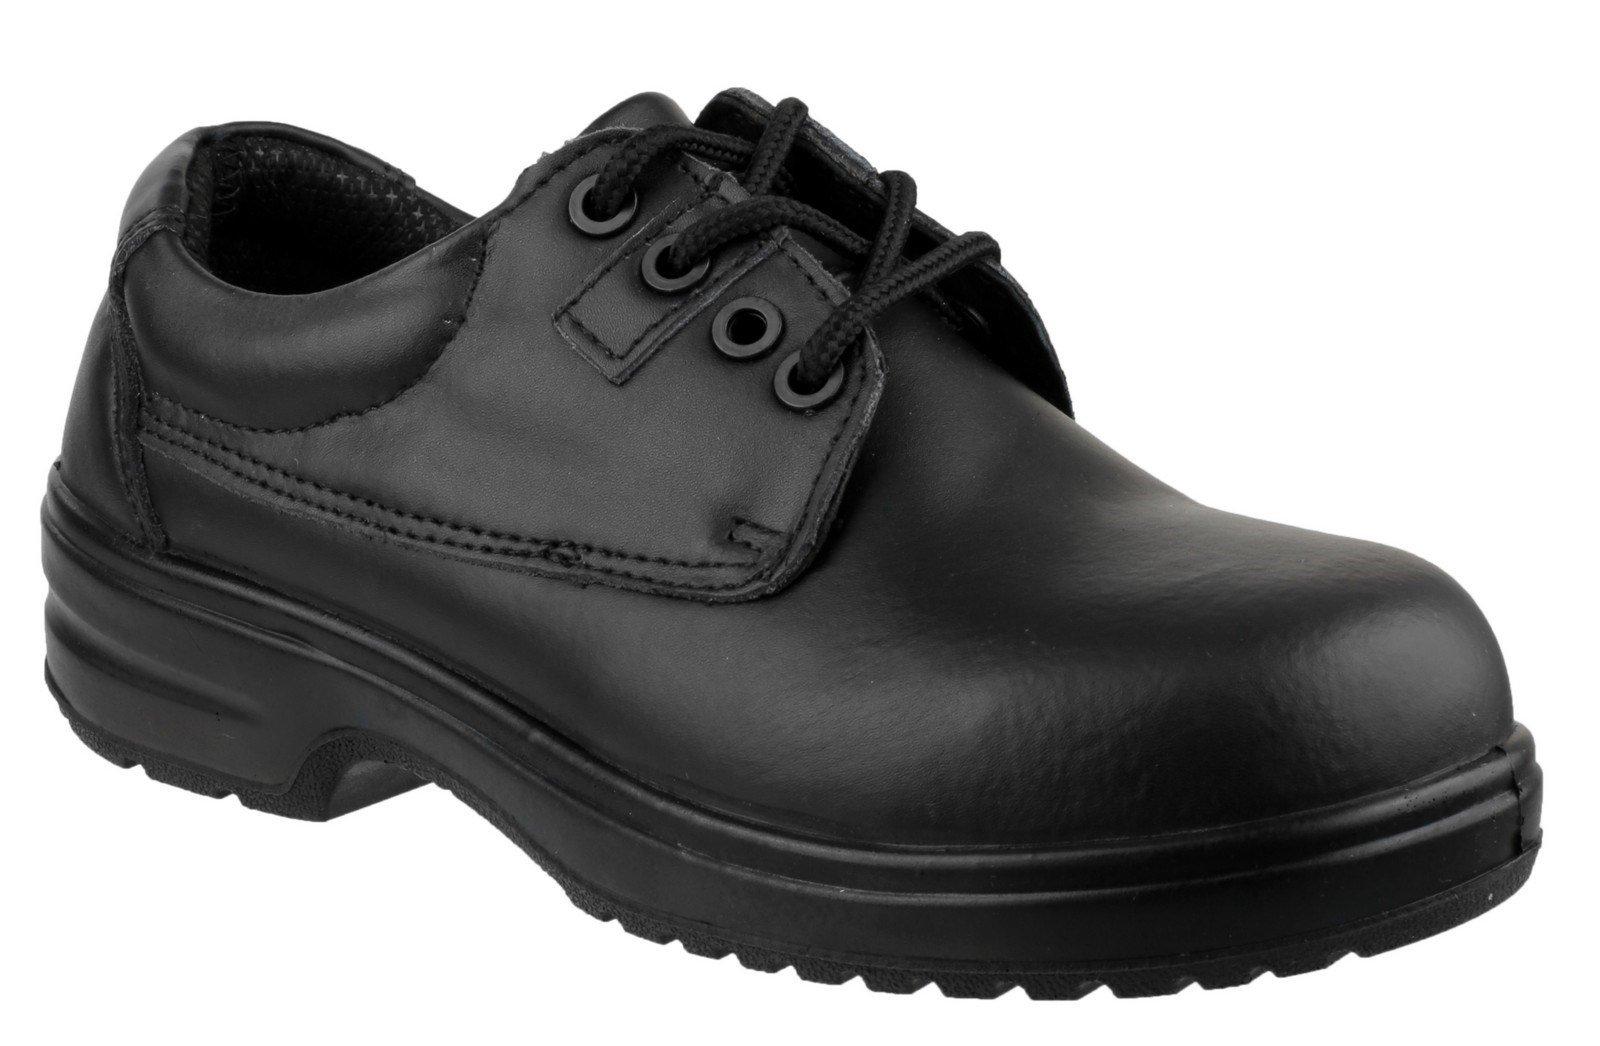 Amblers Women's Safety Metal Free Lace up Shoe Black 20442 - Black 2